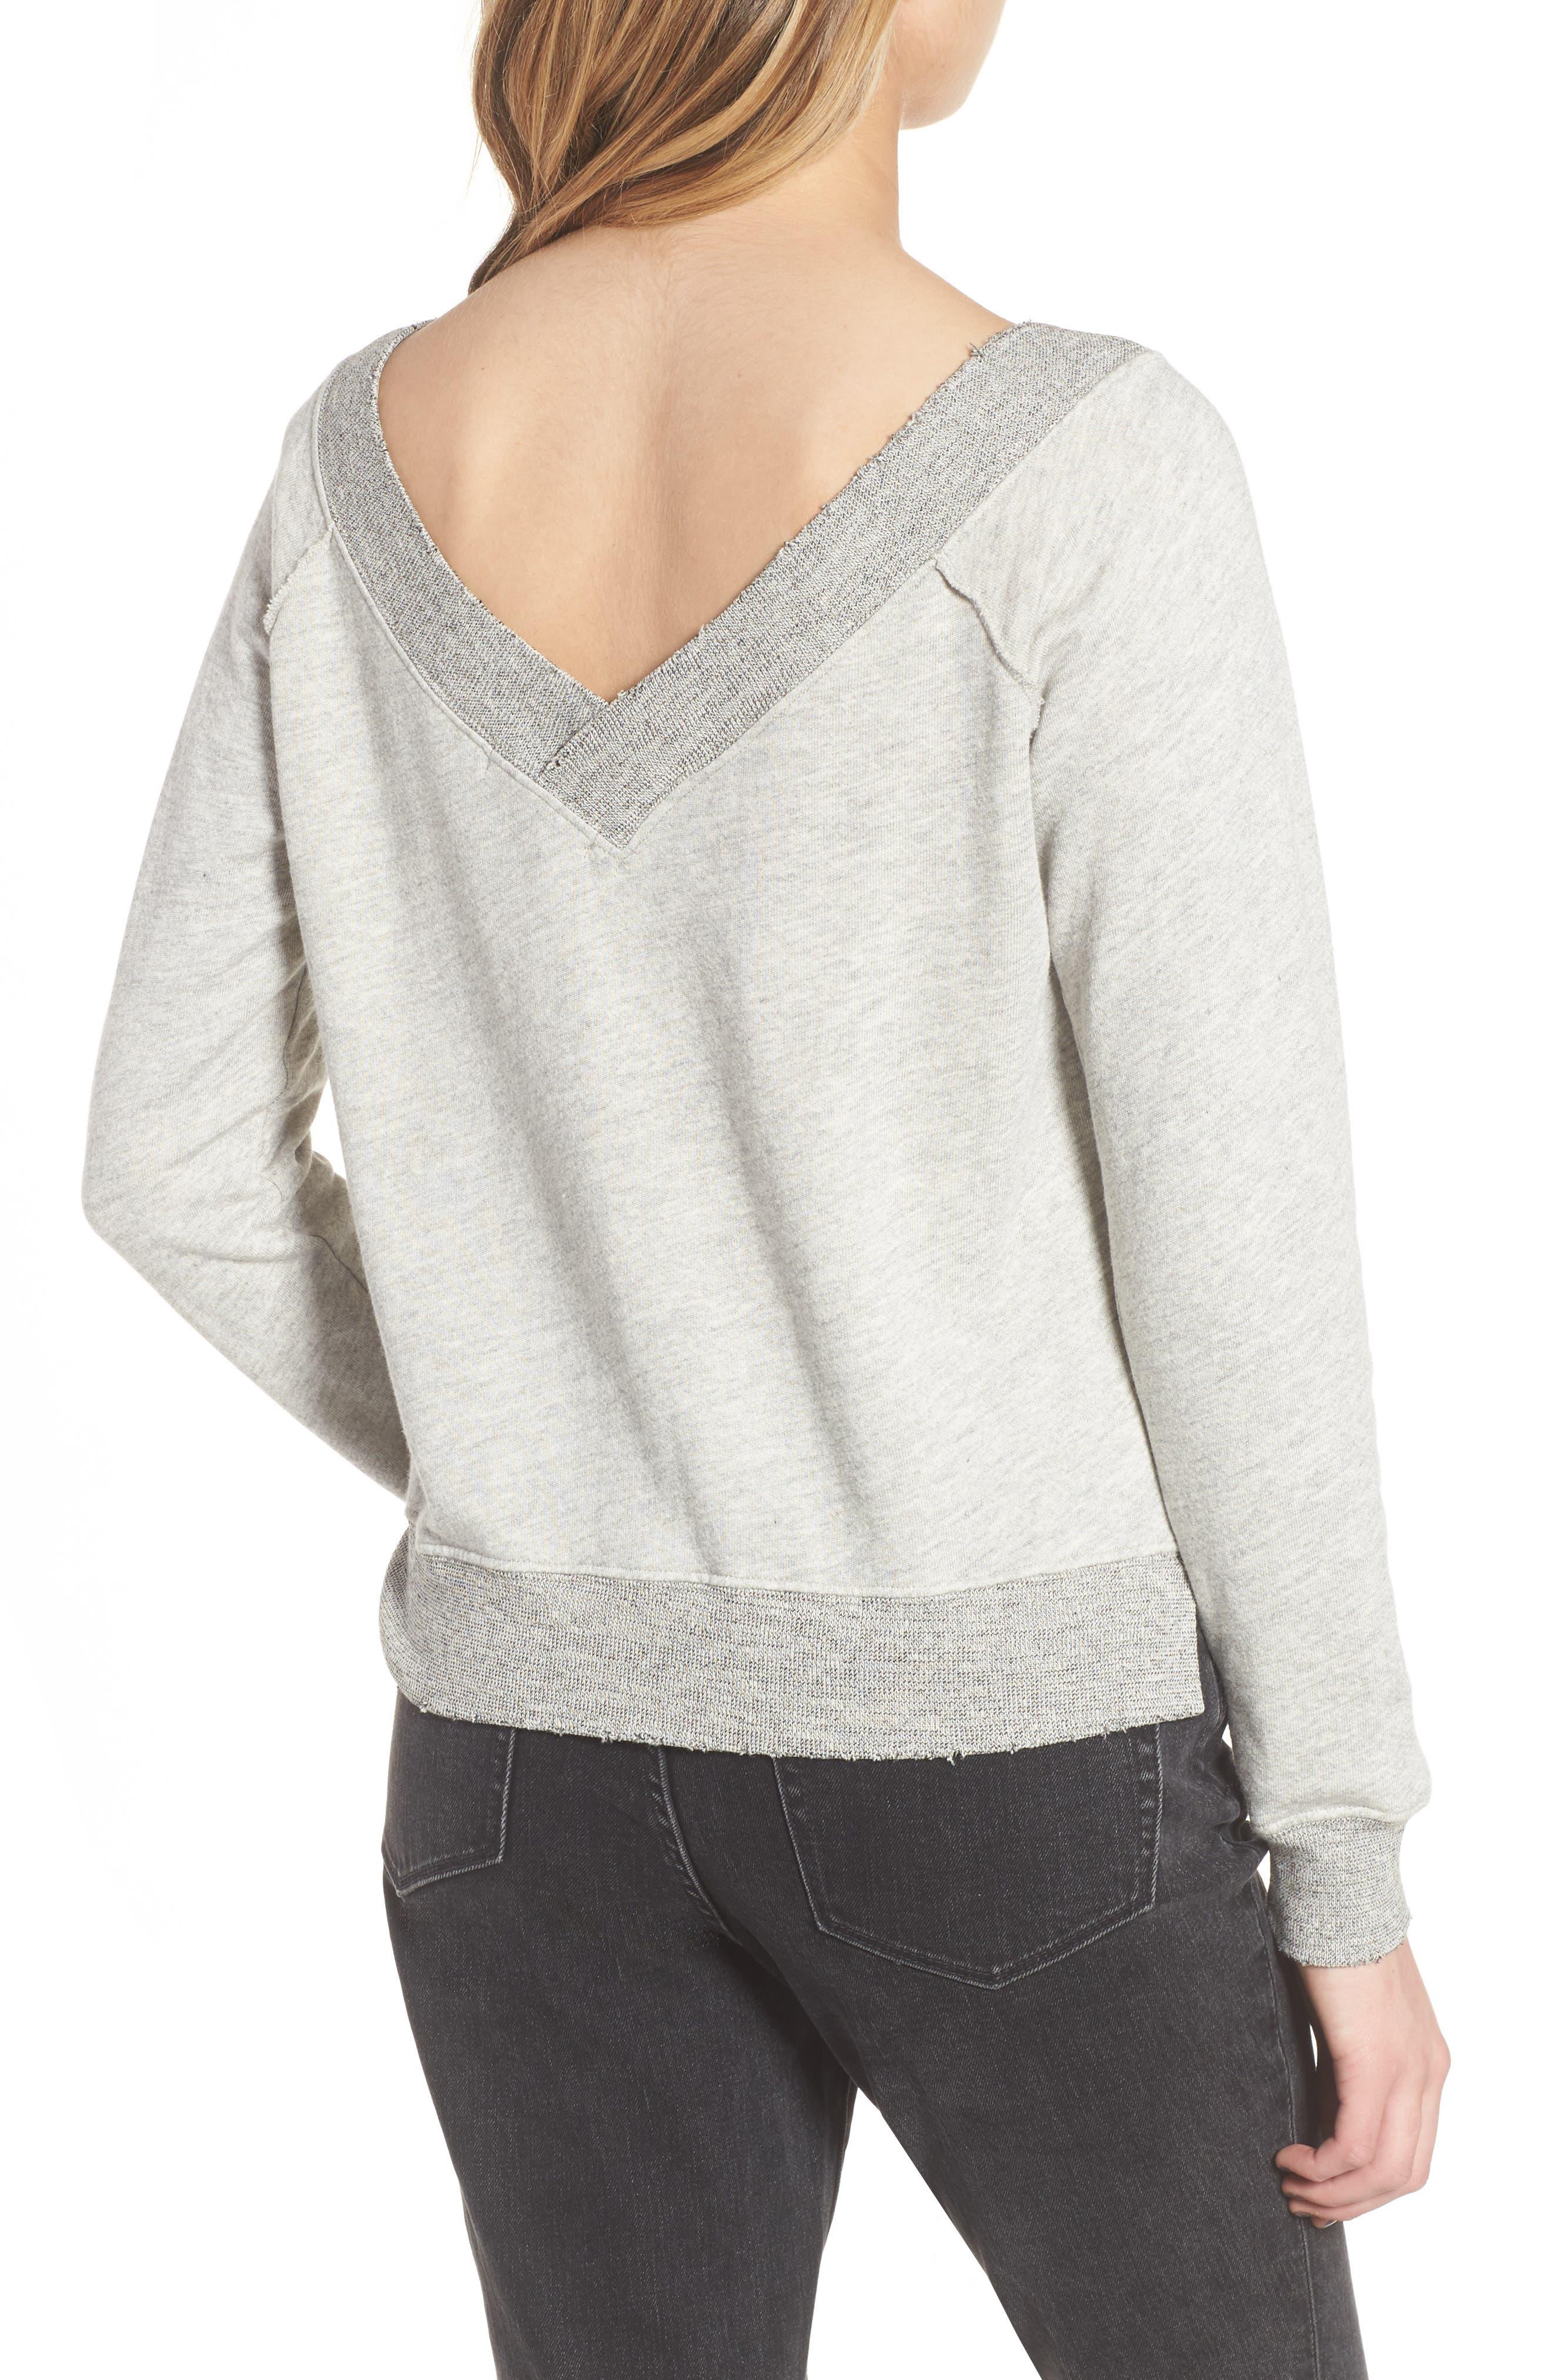 Mayer V-Neck Sweatshirt,                             Alternate thumbnail 2, color,                             Heather Grey